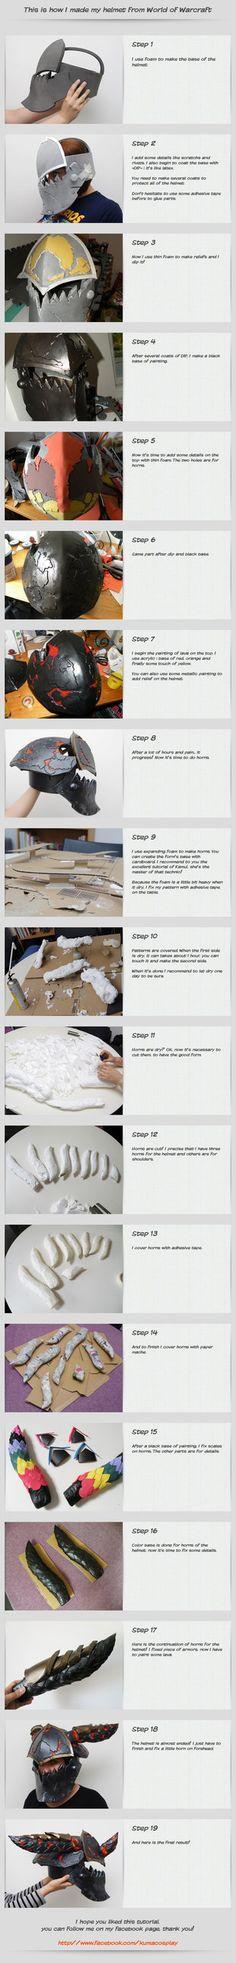 Cosplay tutorial - Helmet of Wow by kurerukreatis on DeviantArt